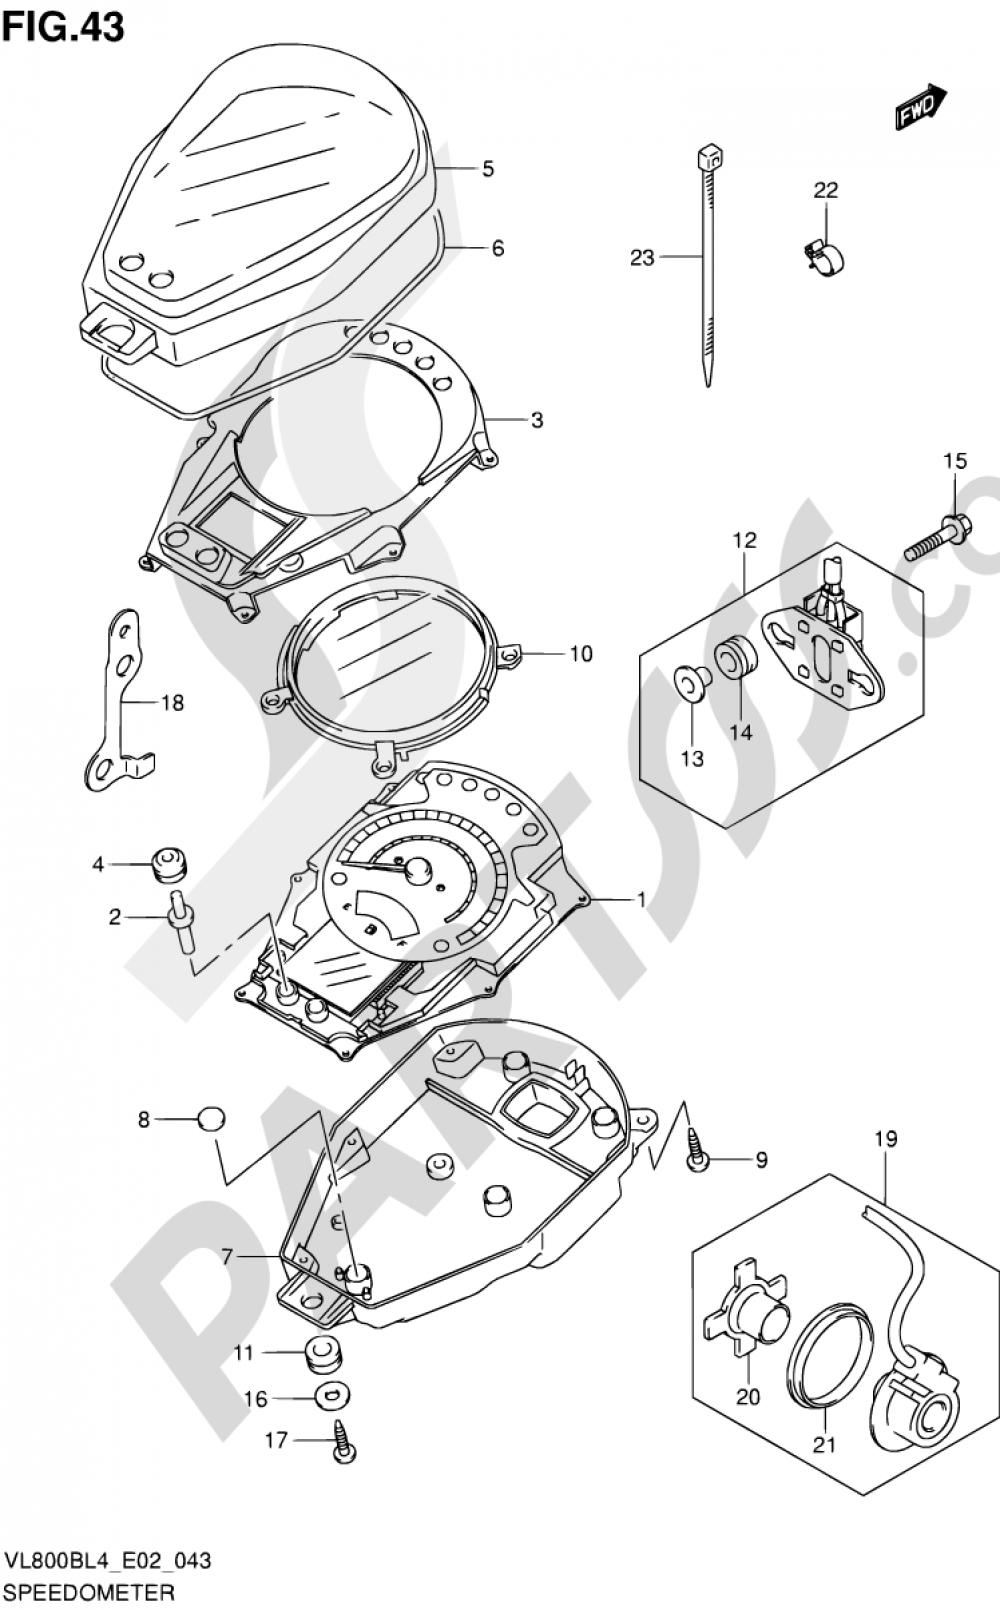 43 - SPEEDOMETER (VL800BL4 E02) Suzuki INTRUDER VL800 2014